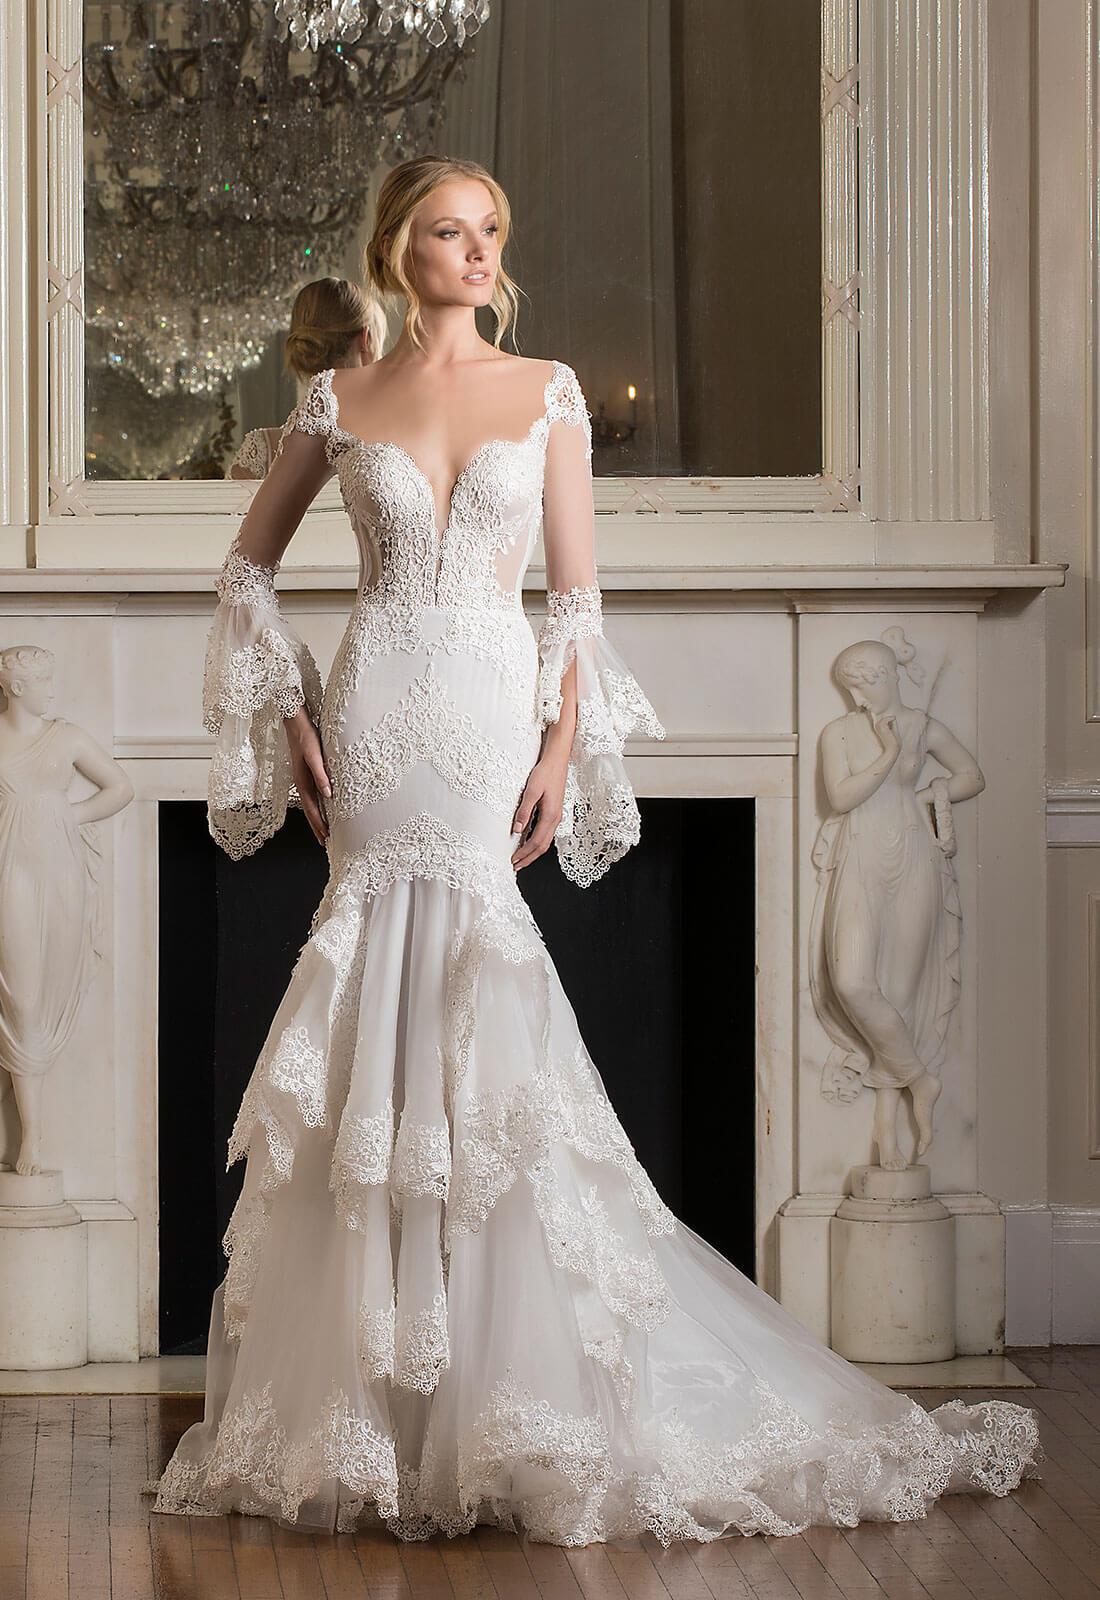 couture bridal shoes photo - 1